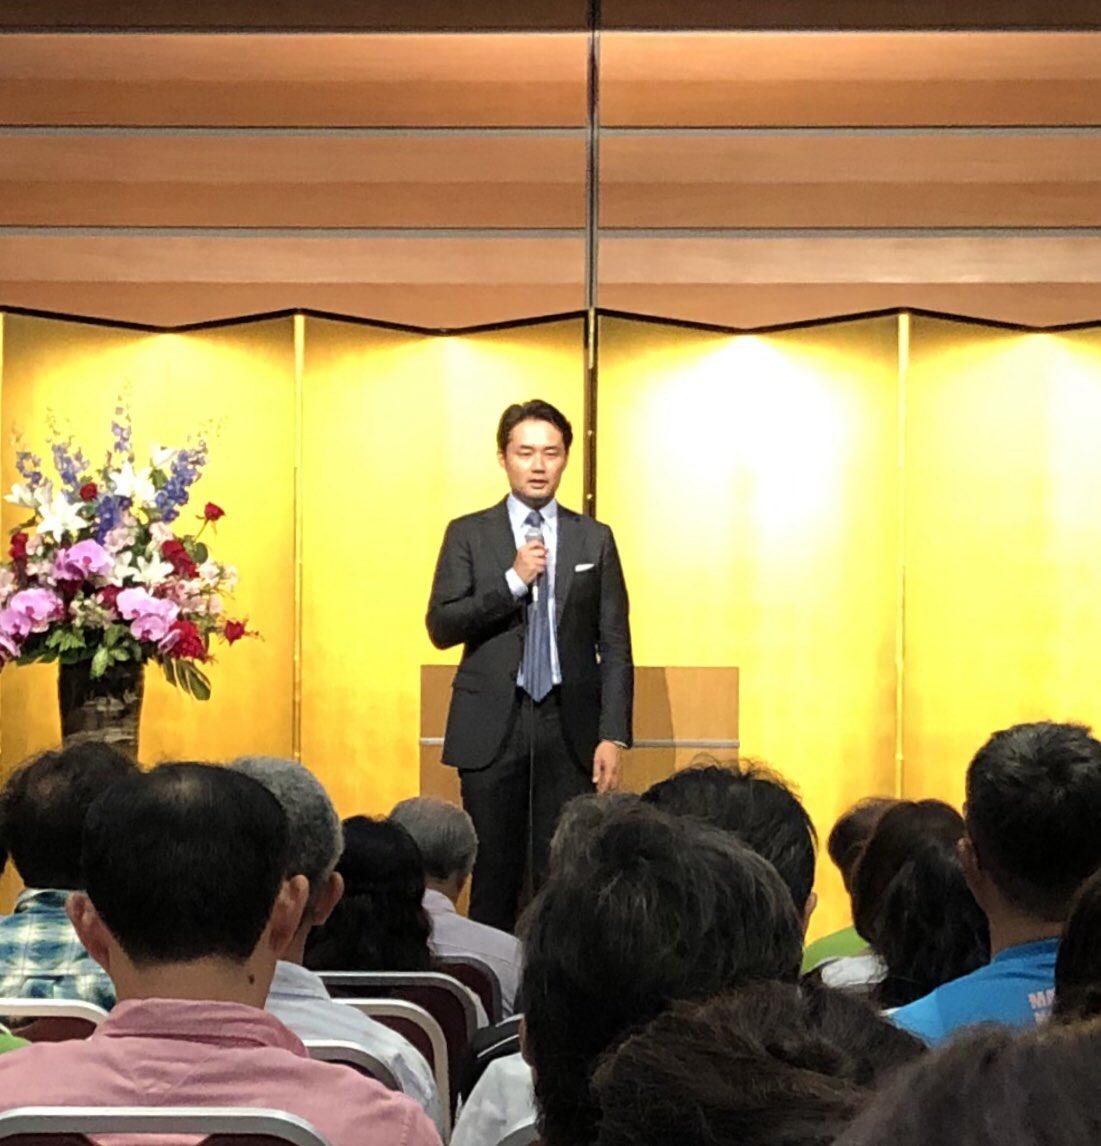 test ツイッターメディア - 昨日行ったセミナー。 講師⁉️ 杉村太蔵。 不覚にも笑ってしまった😅 座布団3枚😁  本人御希望の為UP😏 https://t.co/WbWc2sNimj